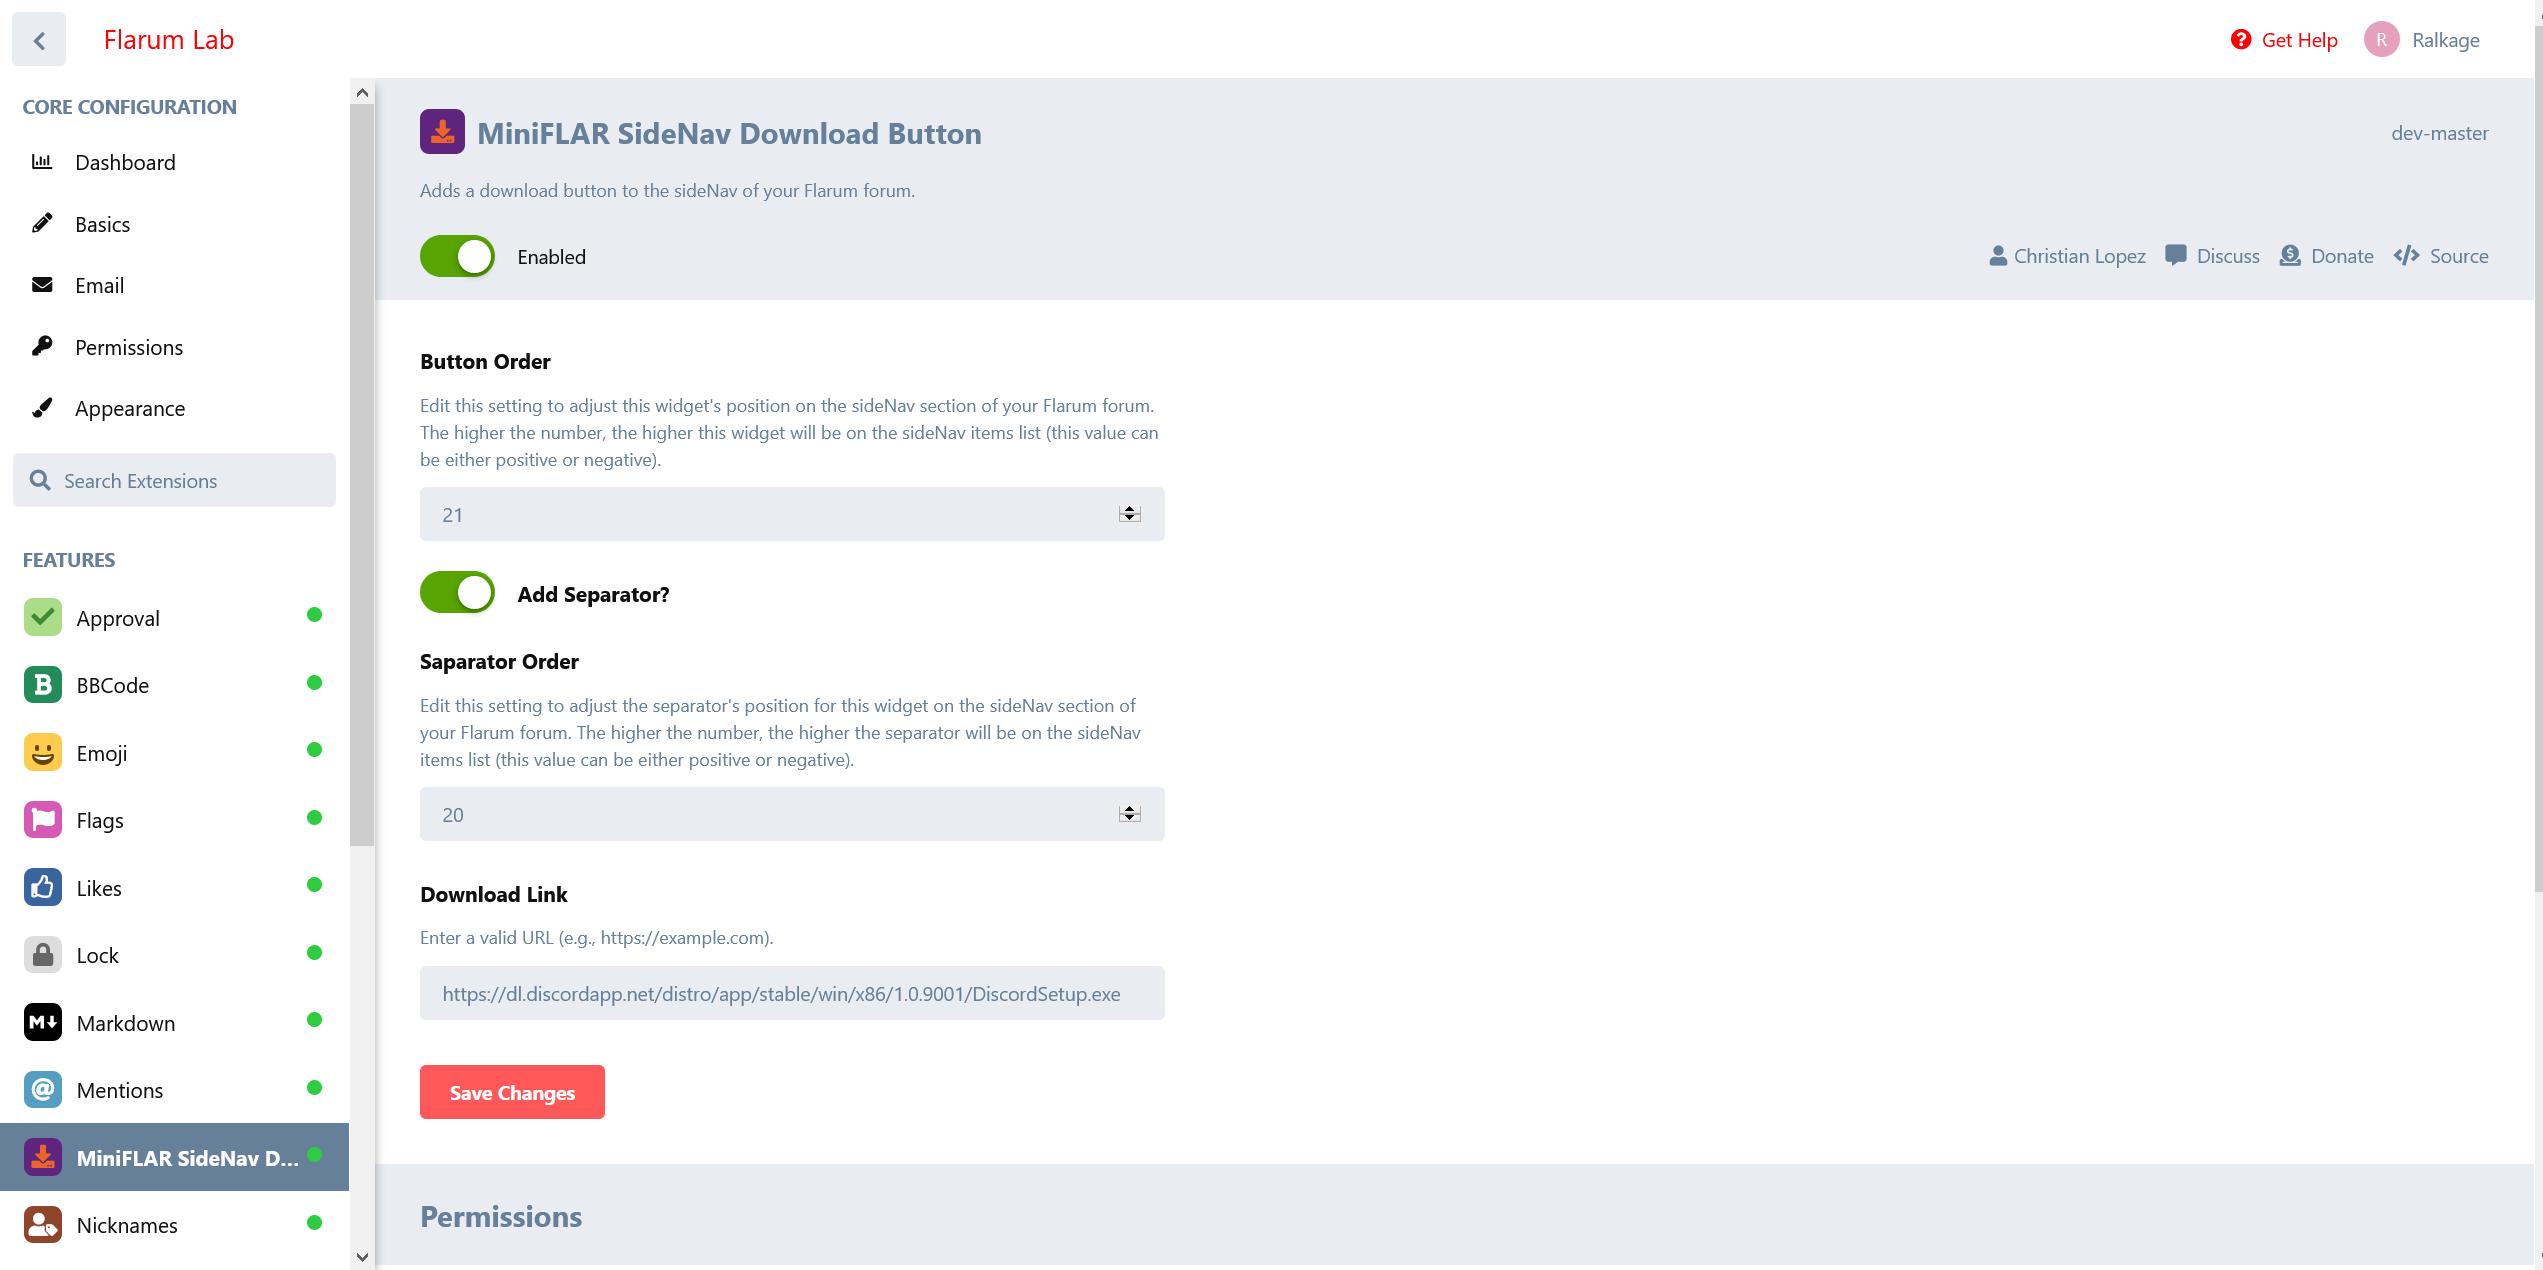 MiniFLAR SideNav Download Button Settings